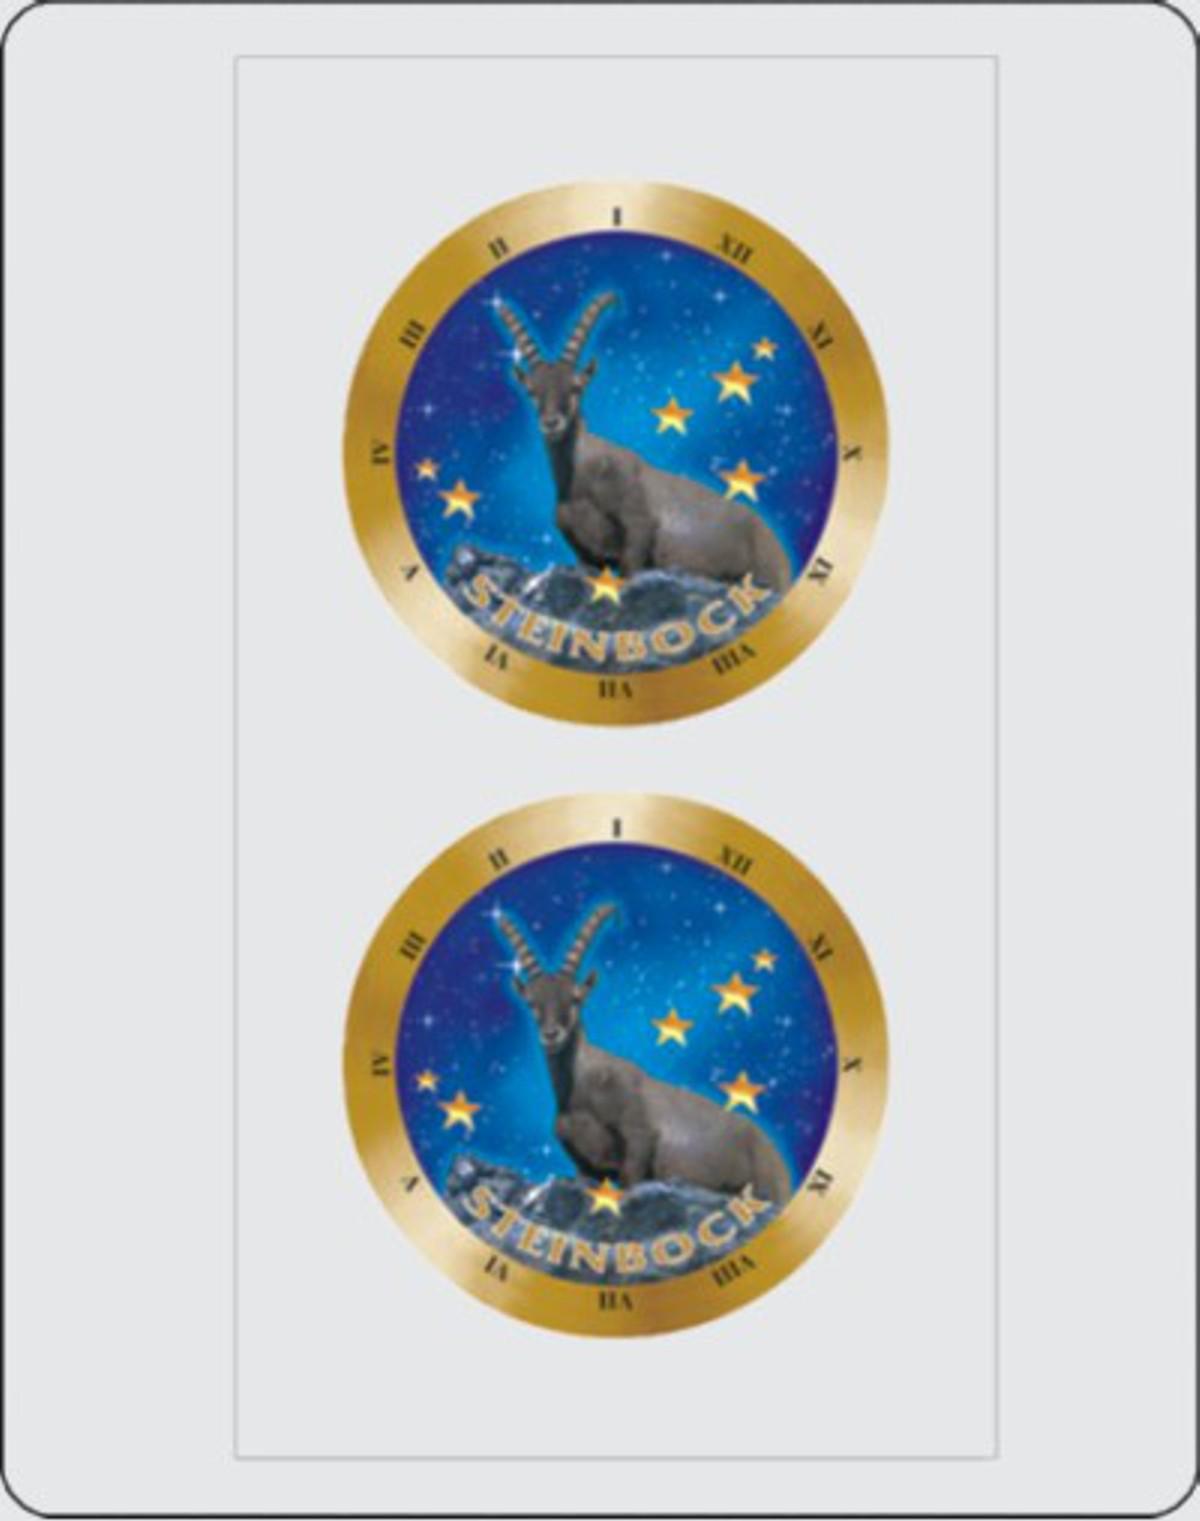 Sticker Star Sign Capricorn Dimension Set Of 2 Each ø 40 Mm